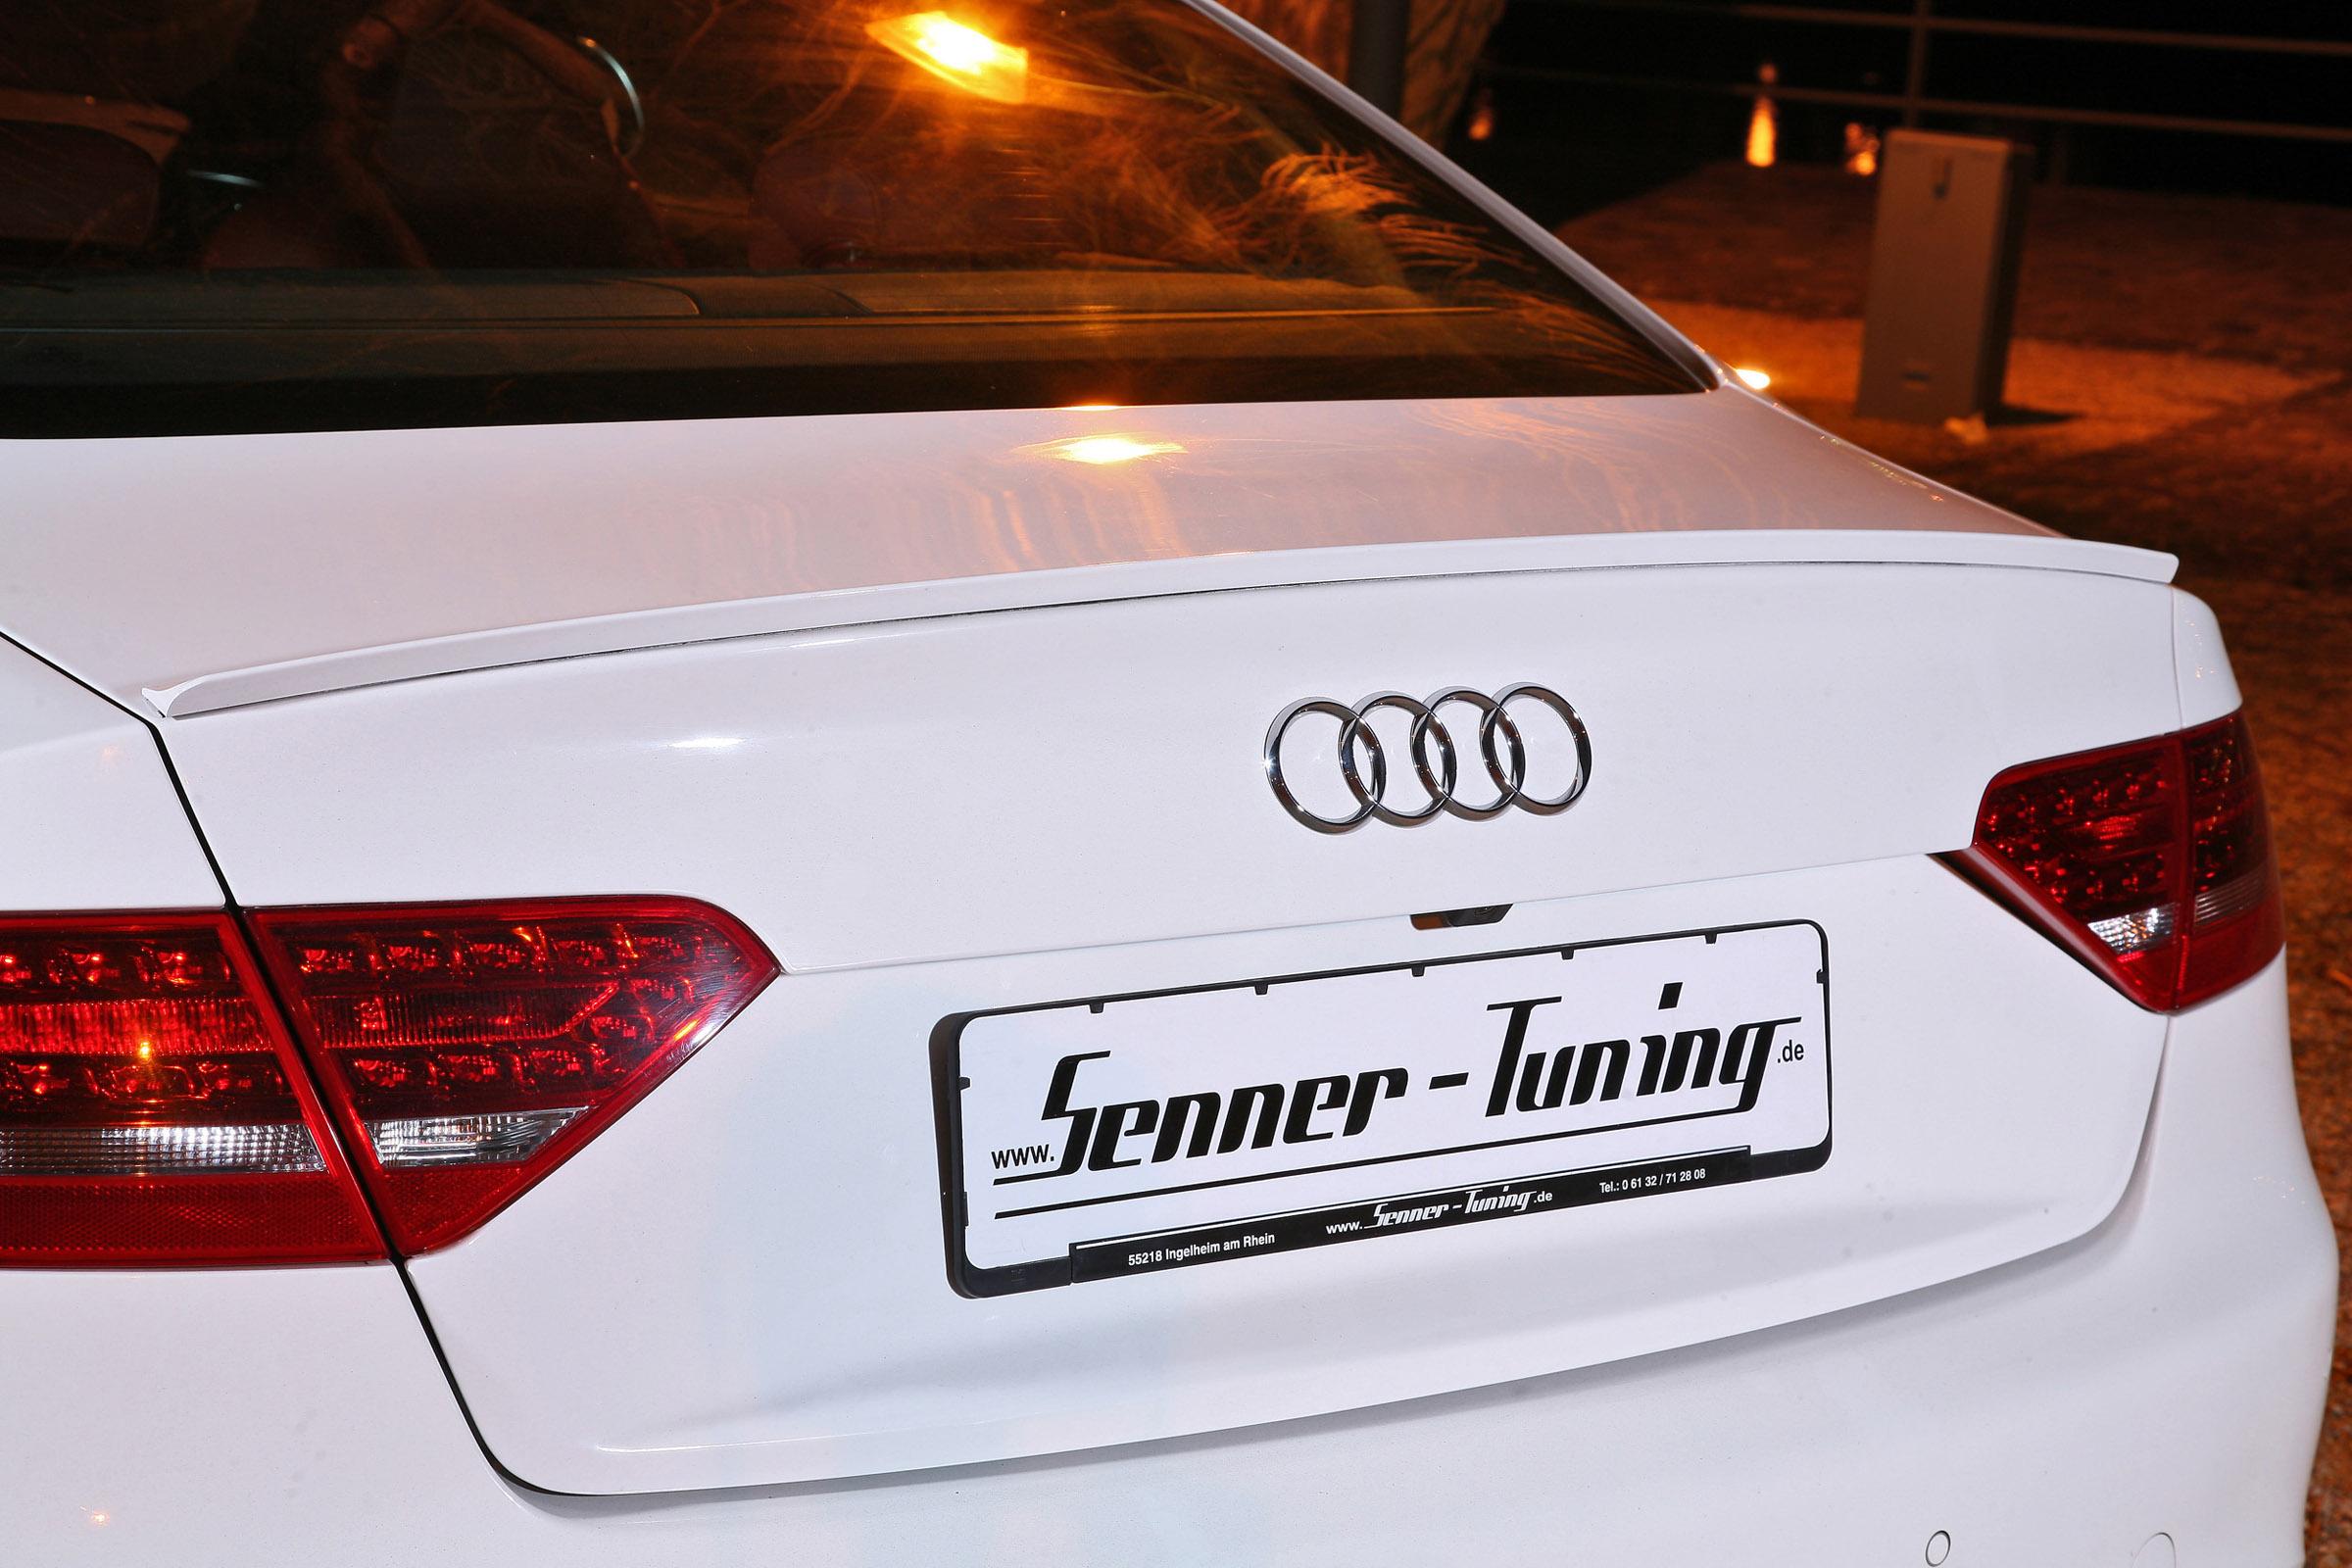 Senner Audi S5 White beast Picture